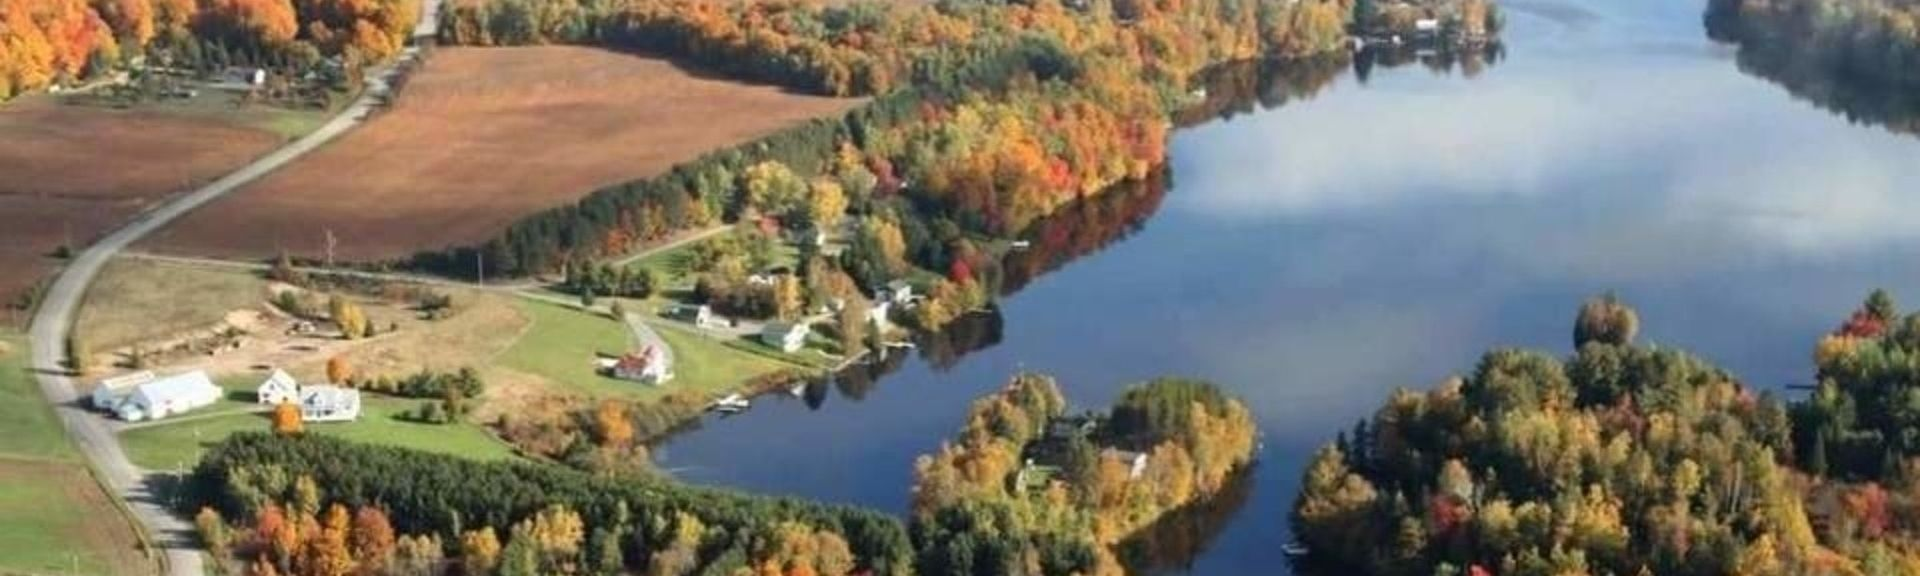 Portneuf Regional County Municipality, QC, Canada